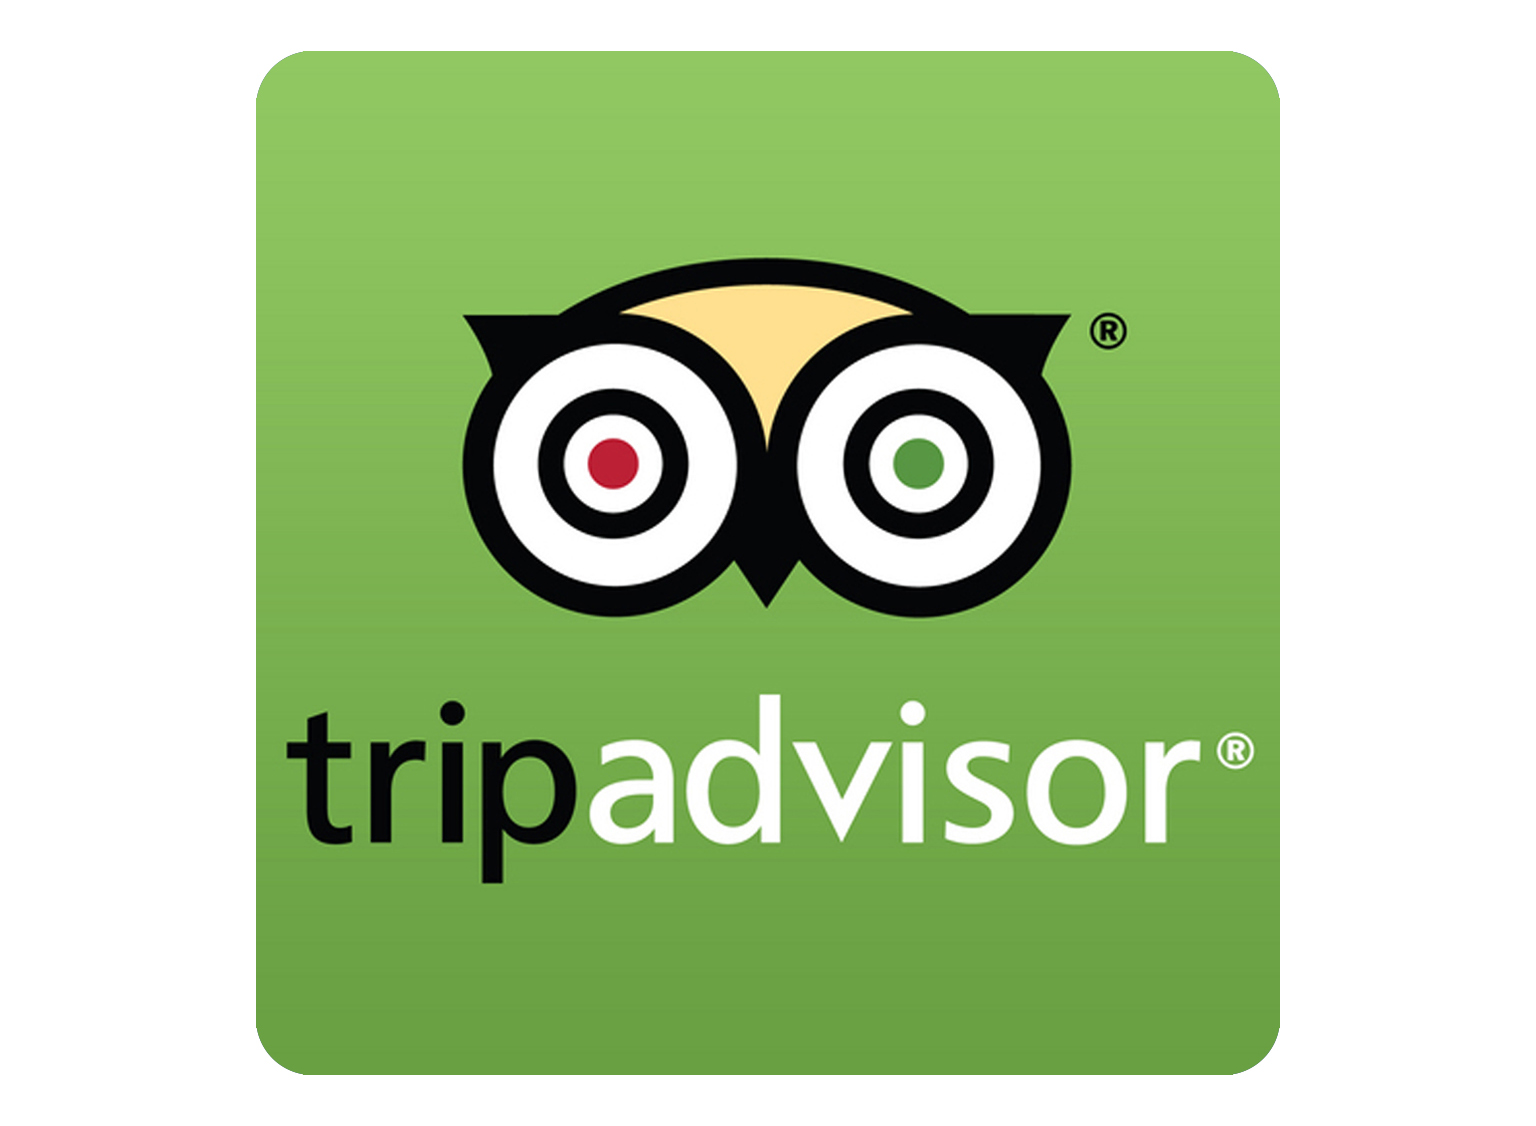 Bildergebnis für tripadvisor logo